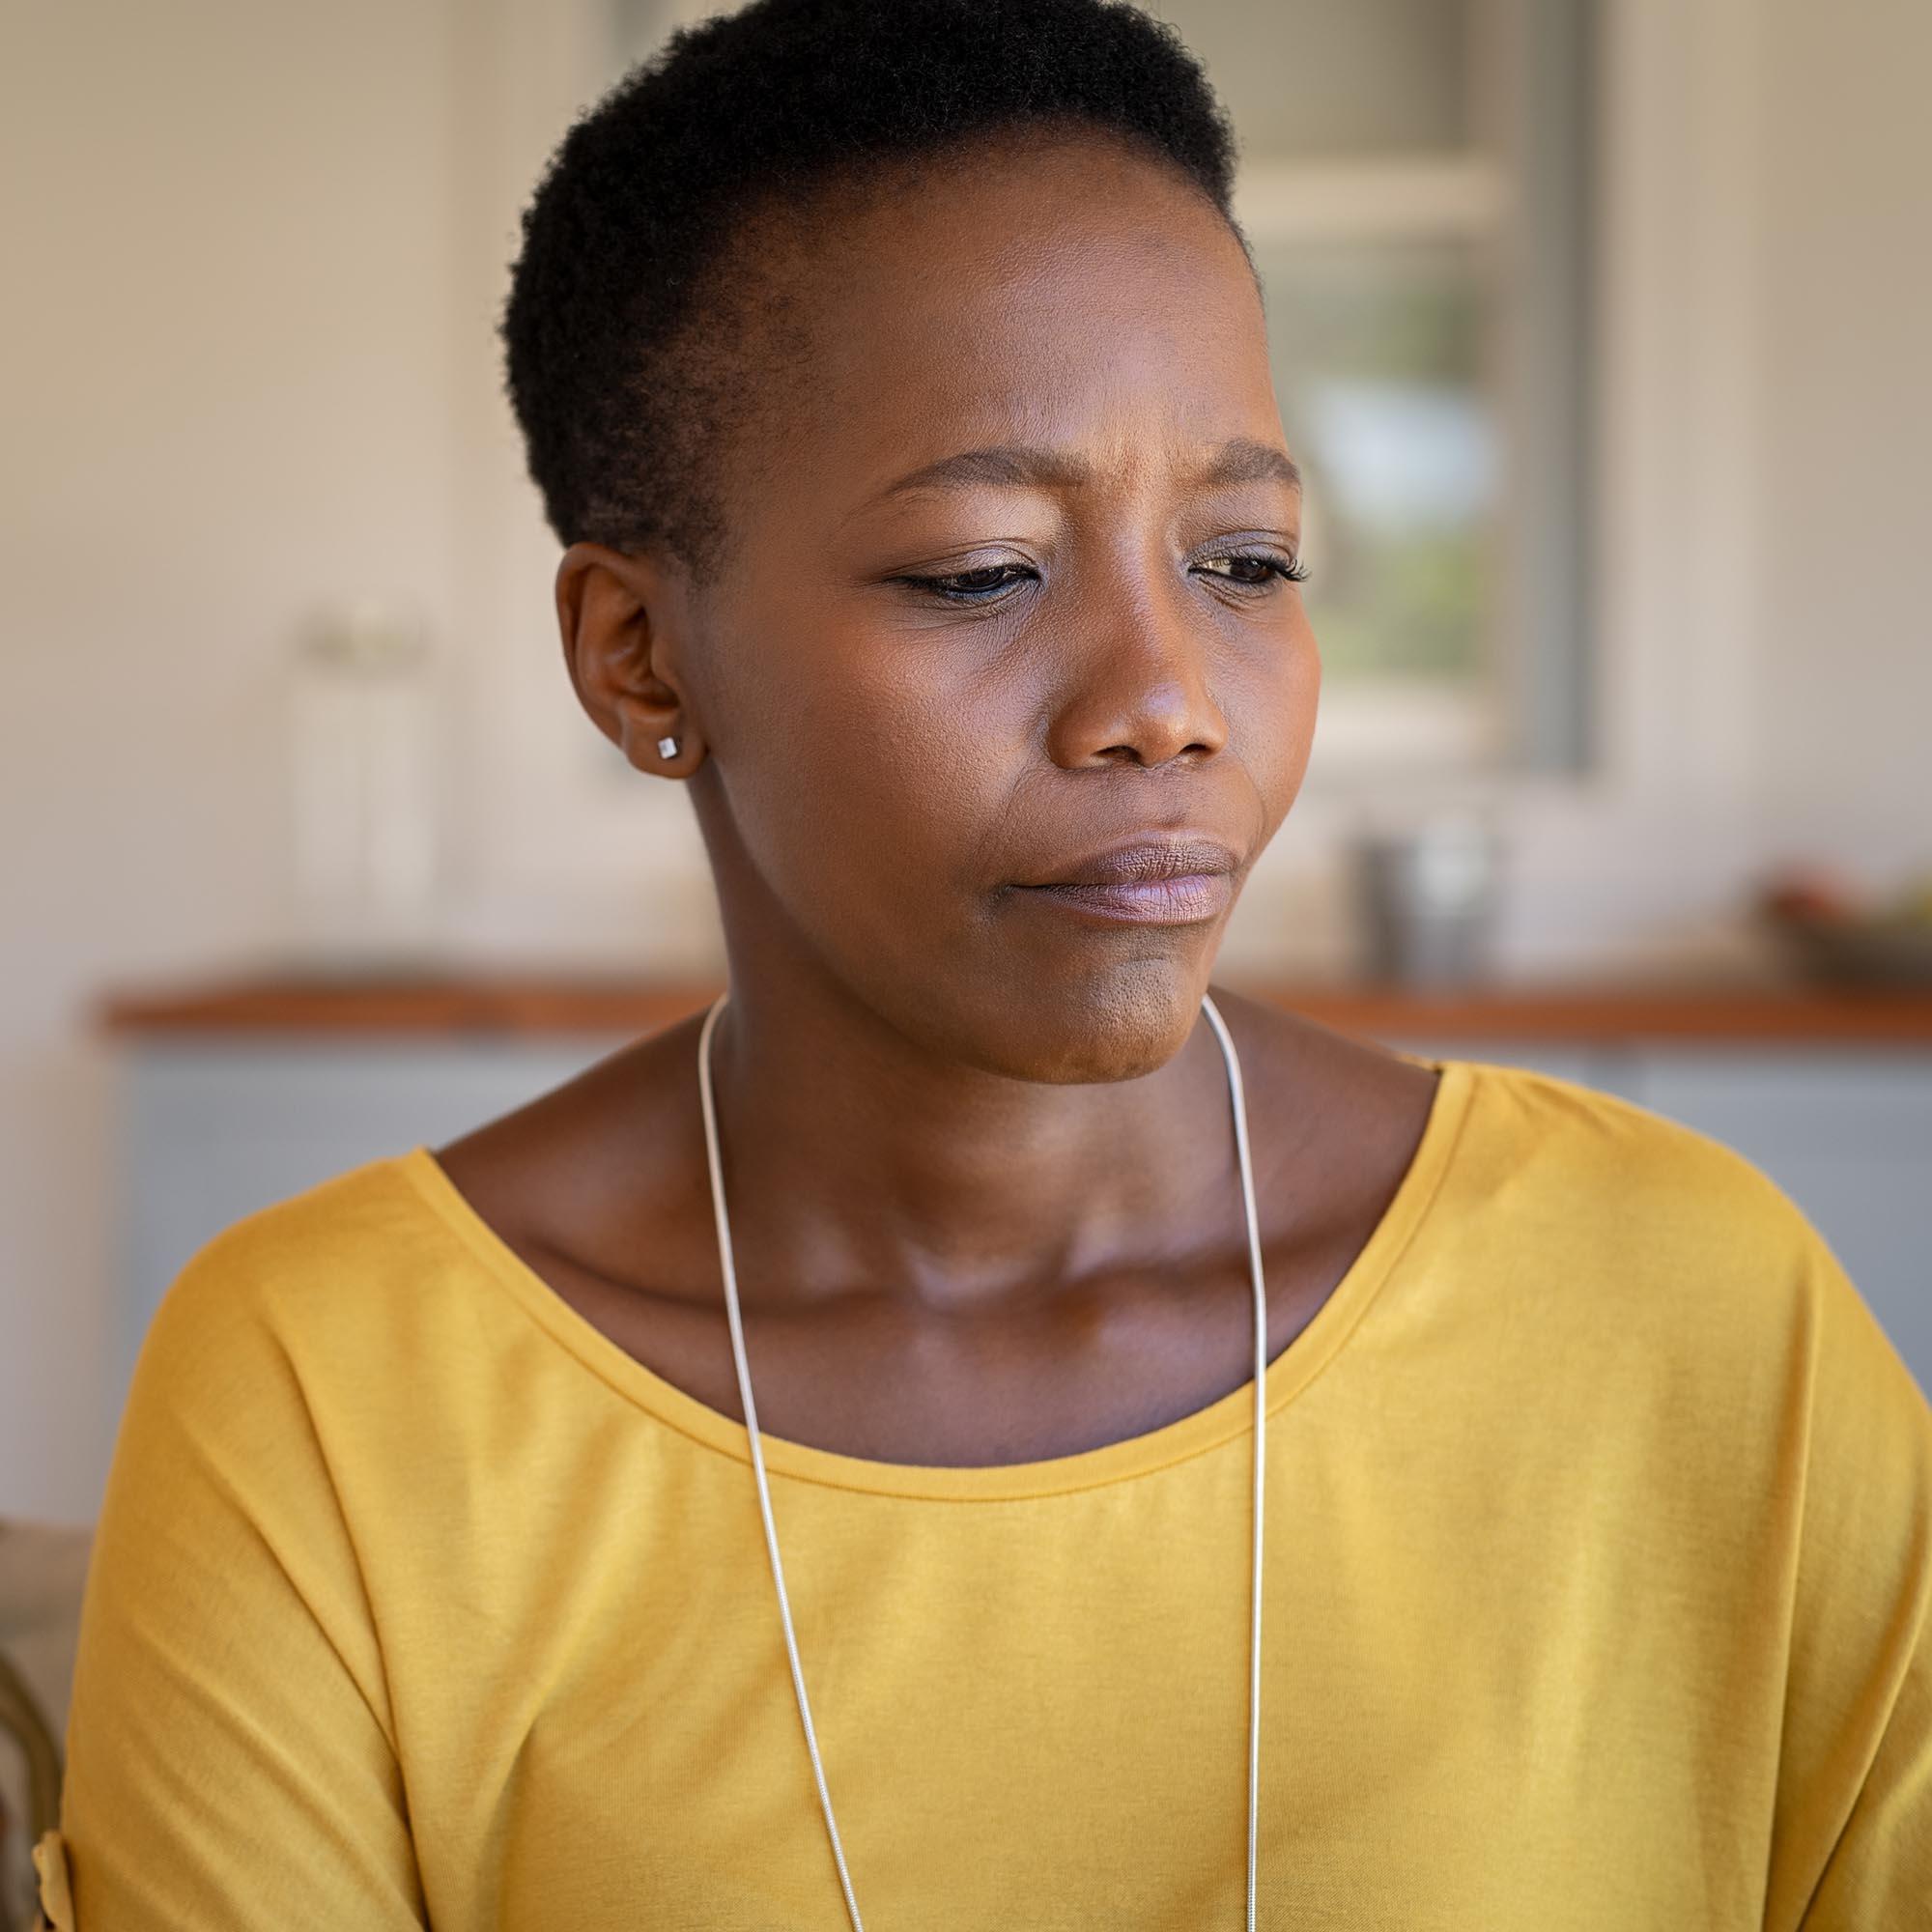 Zimbabweans battle cost and bureaucracy of repatriating dead loved ones